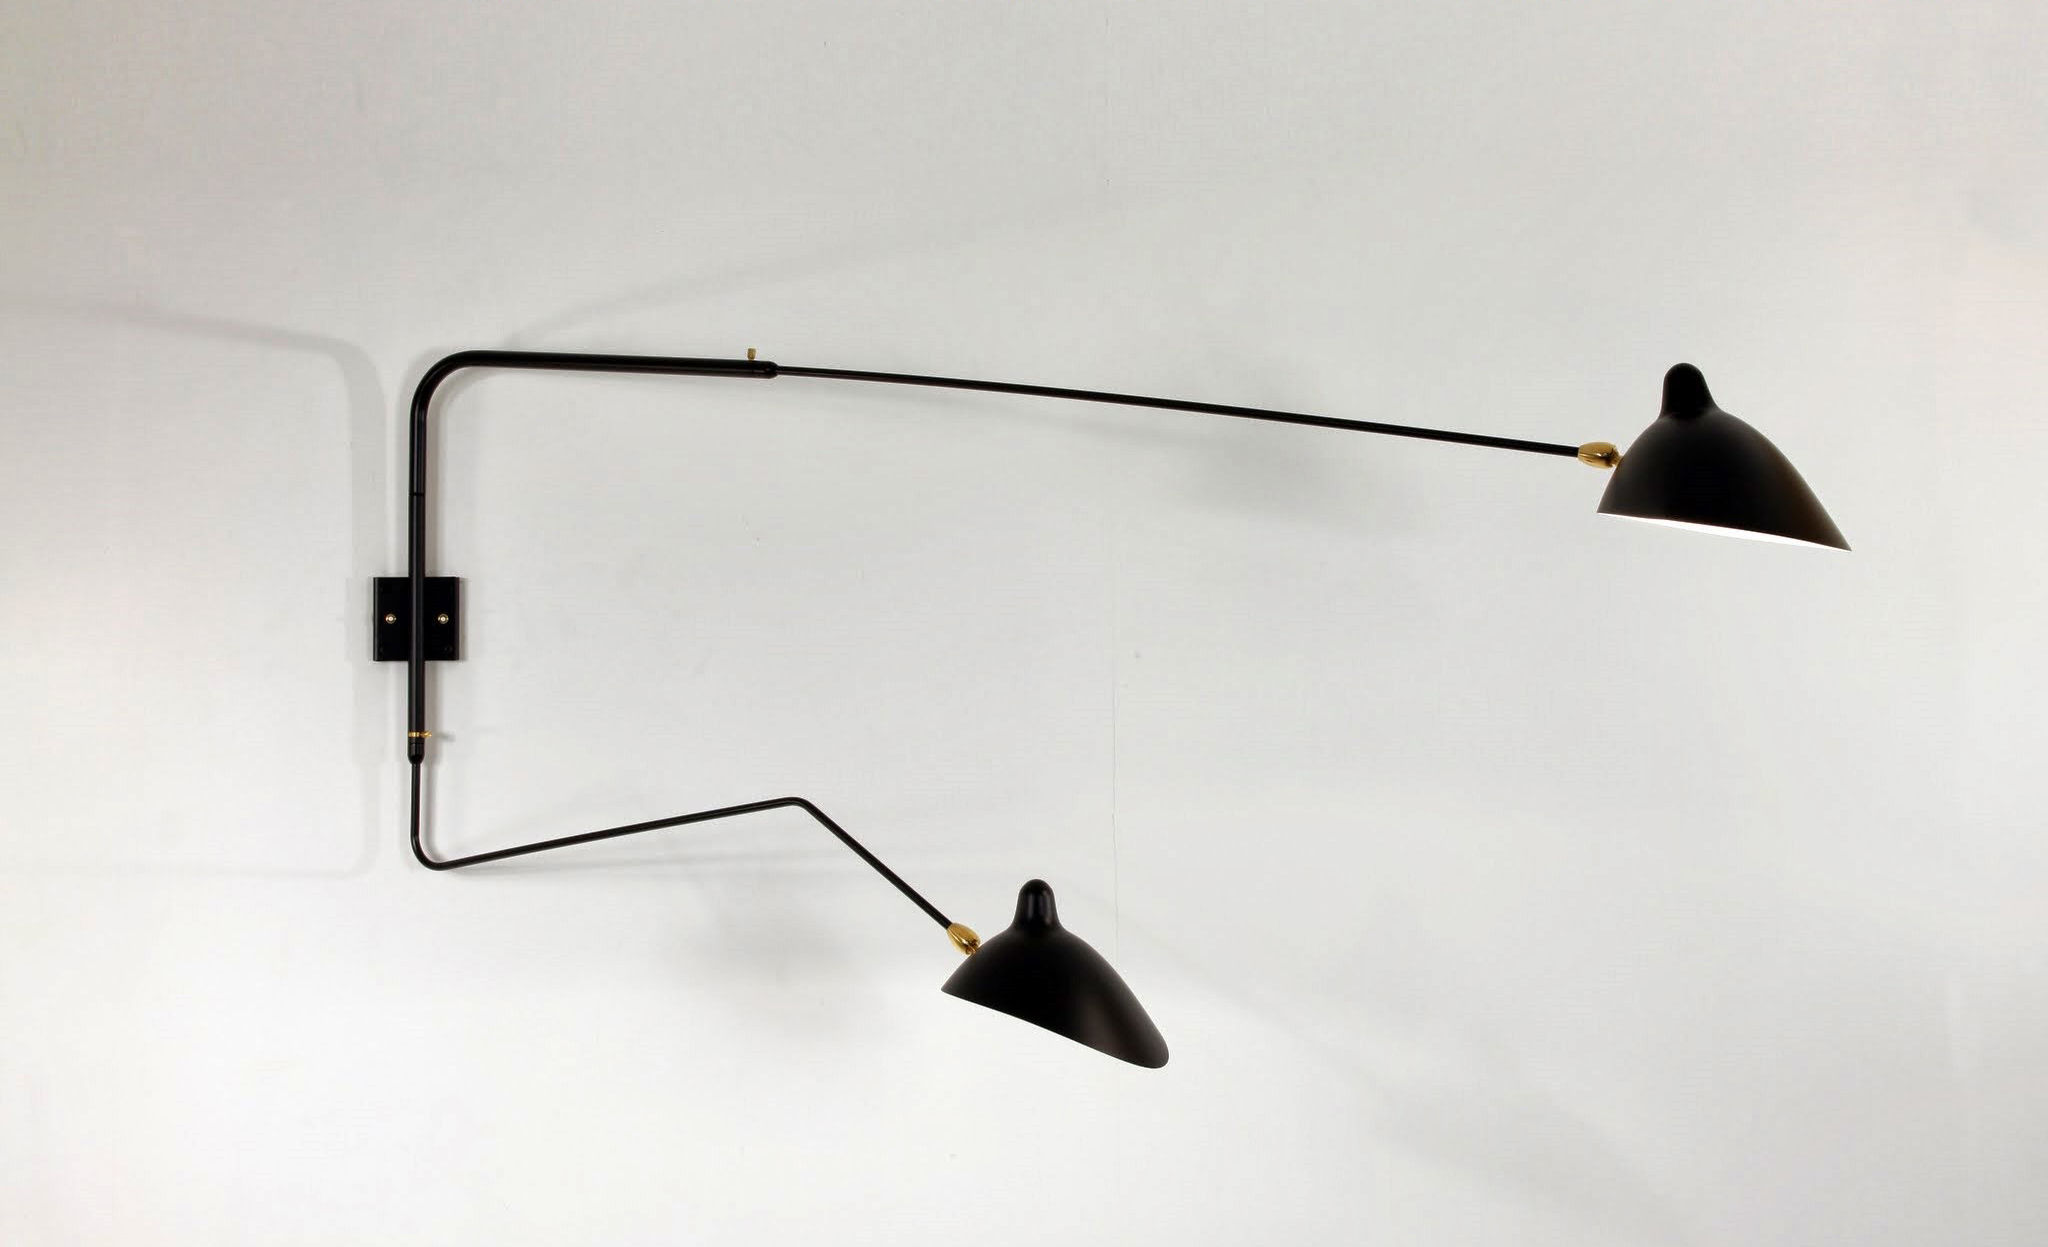 Applique bras serge mouille noir made in design